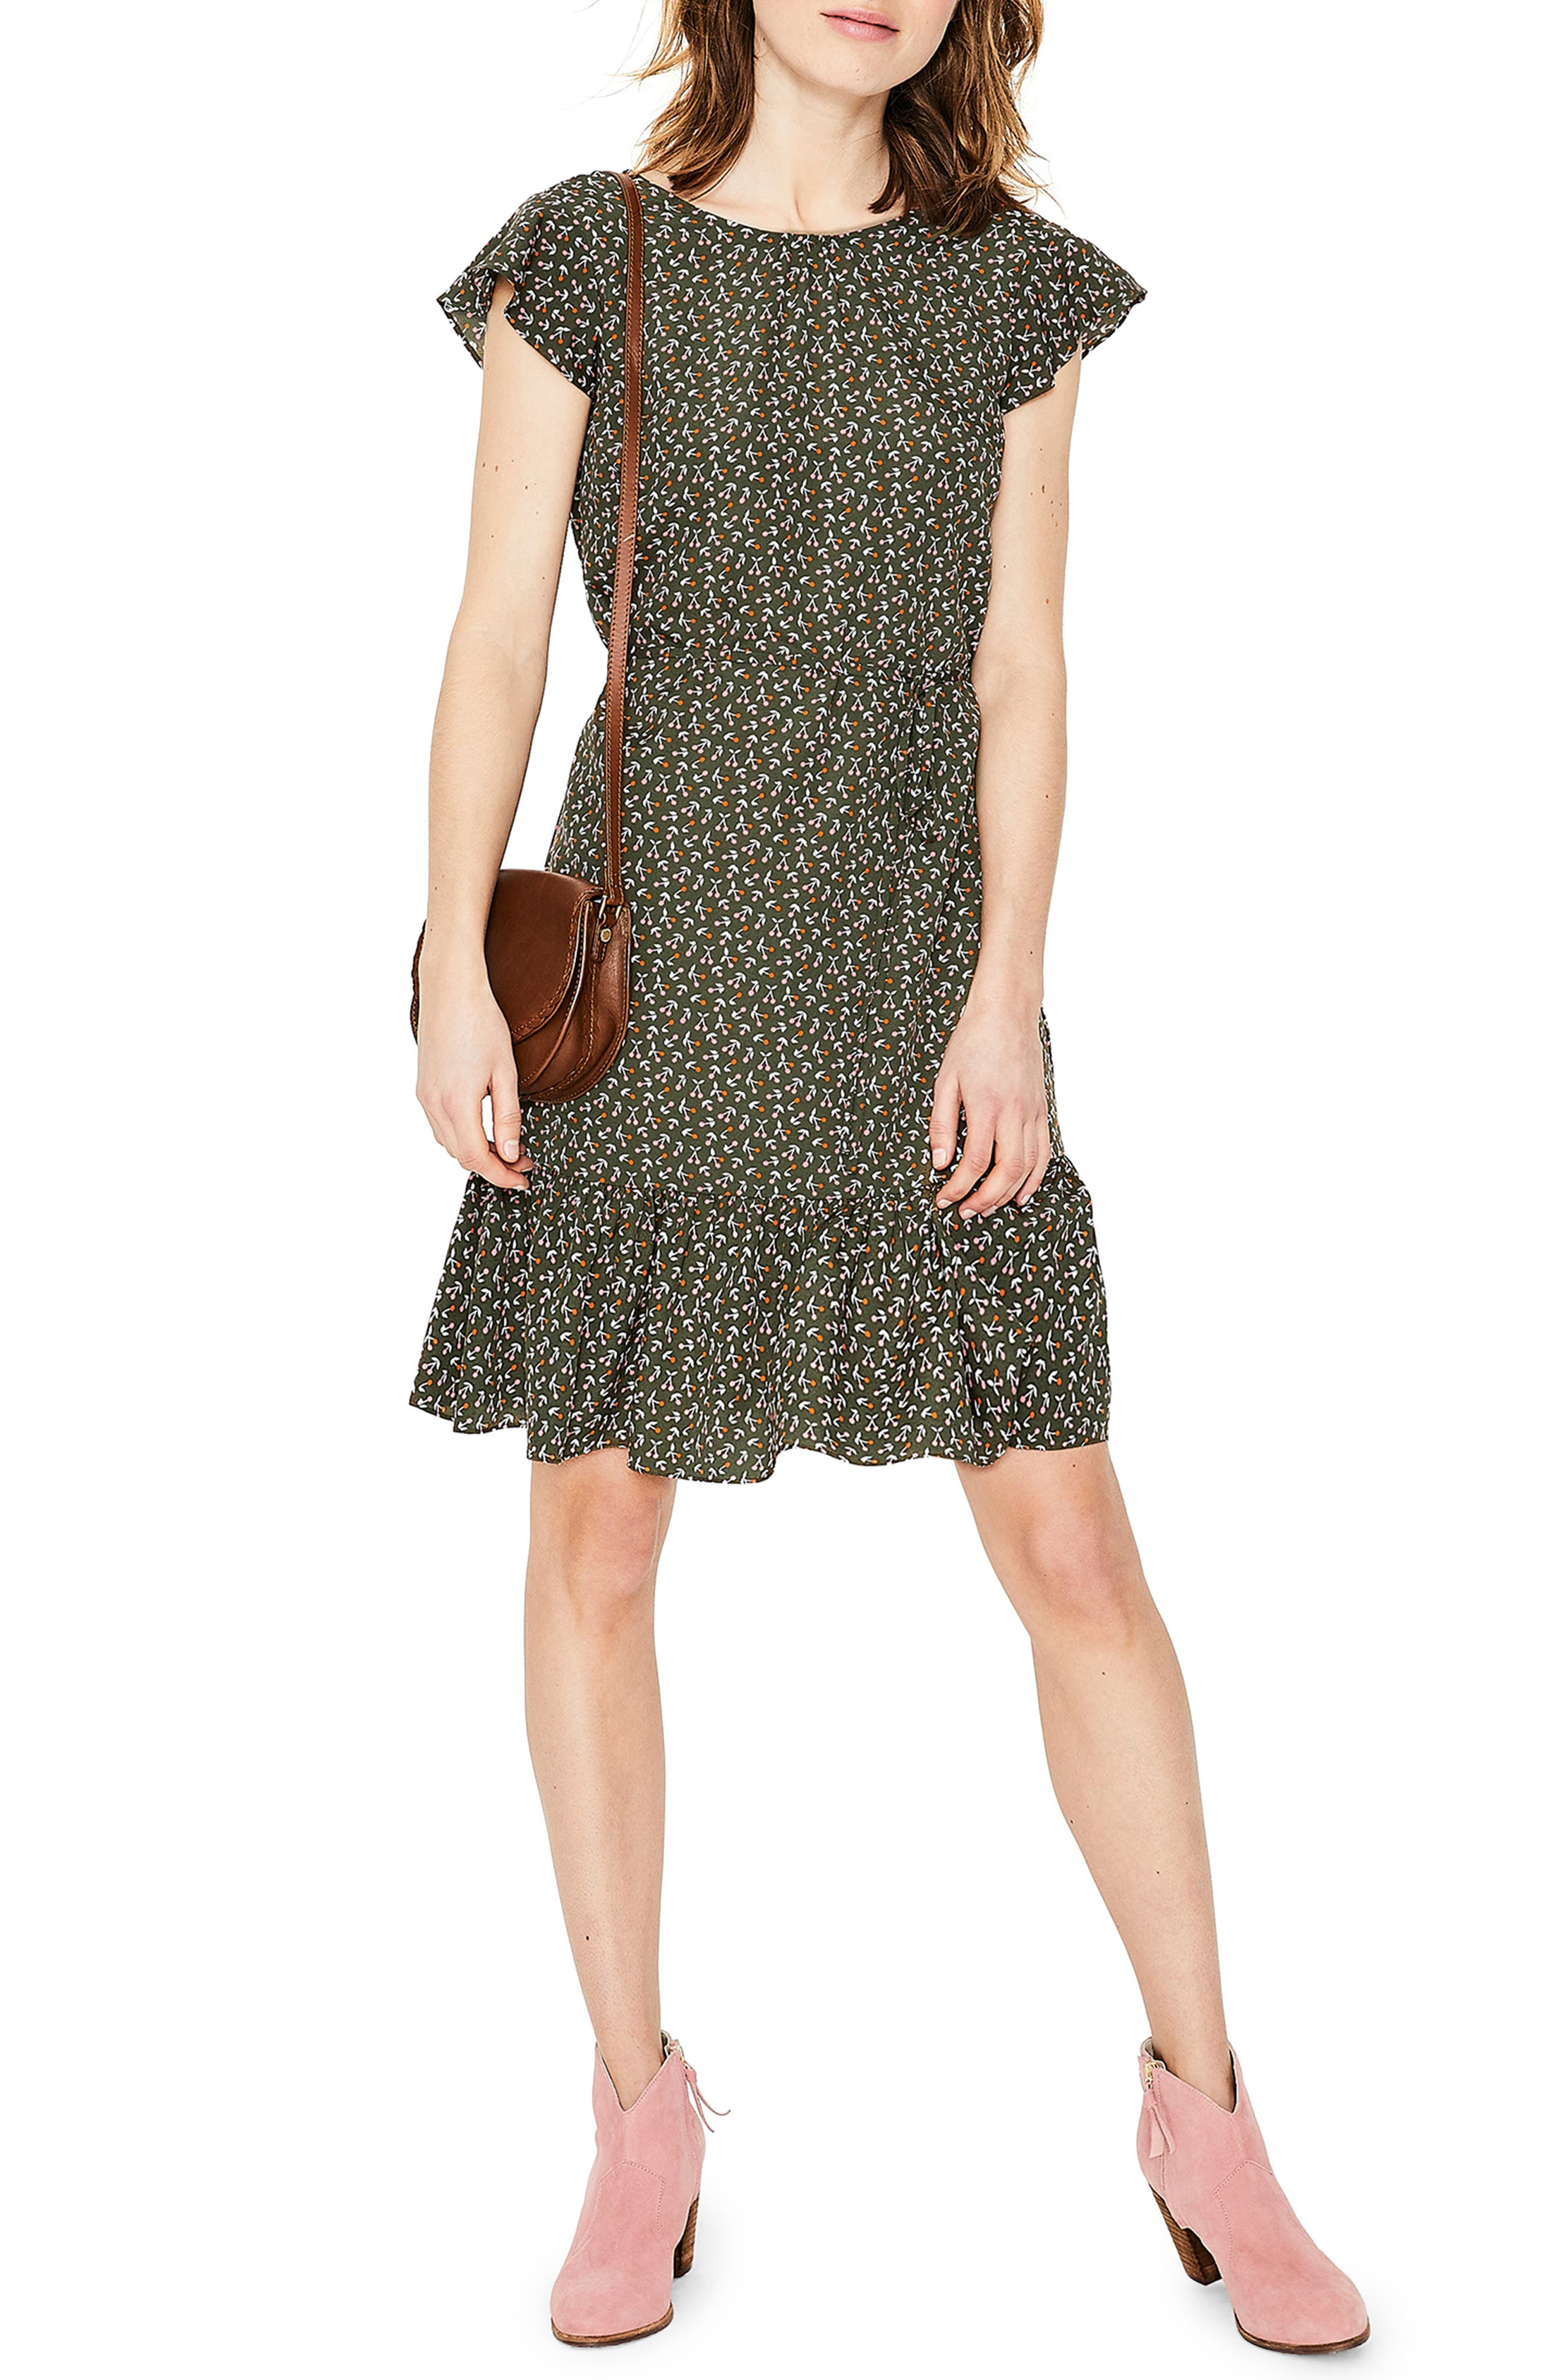 Petite Boden Cynthia Flounced Dress, Green